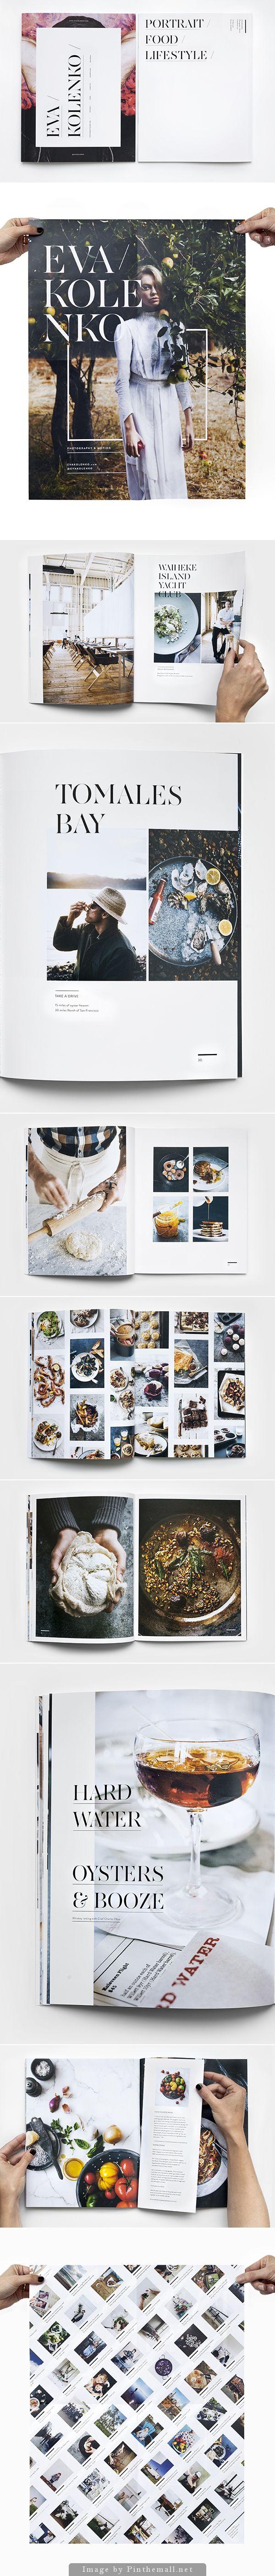 Eva Kolenko / graphisme culinaire.